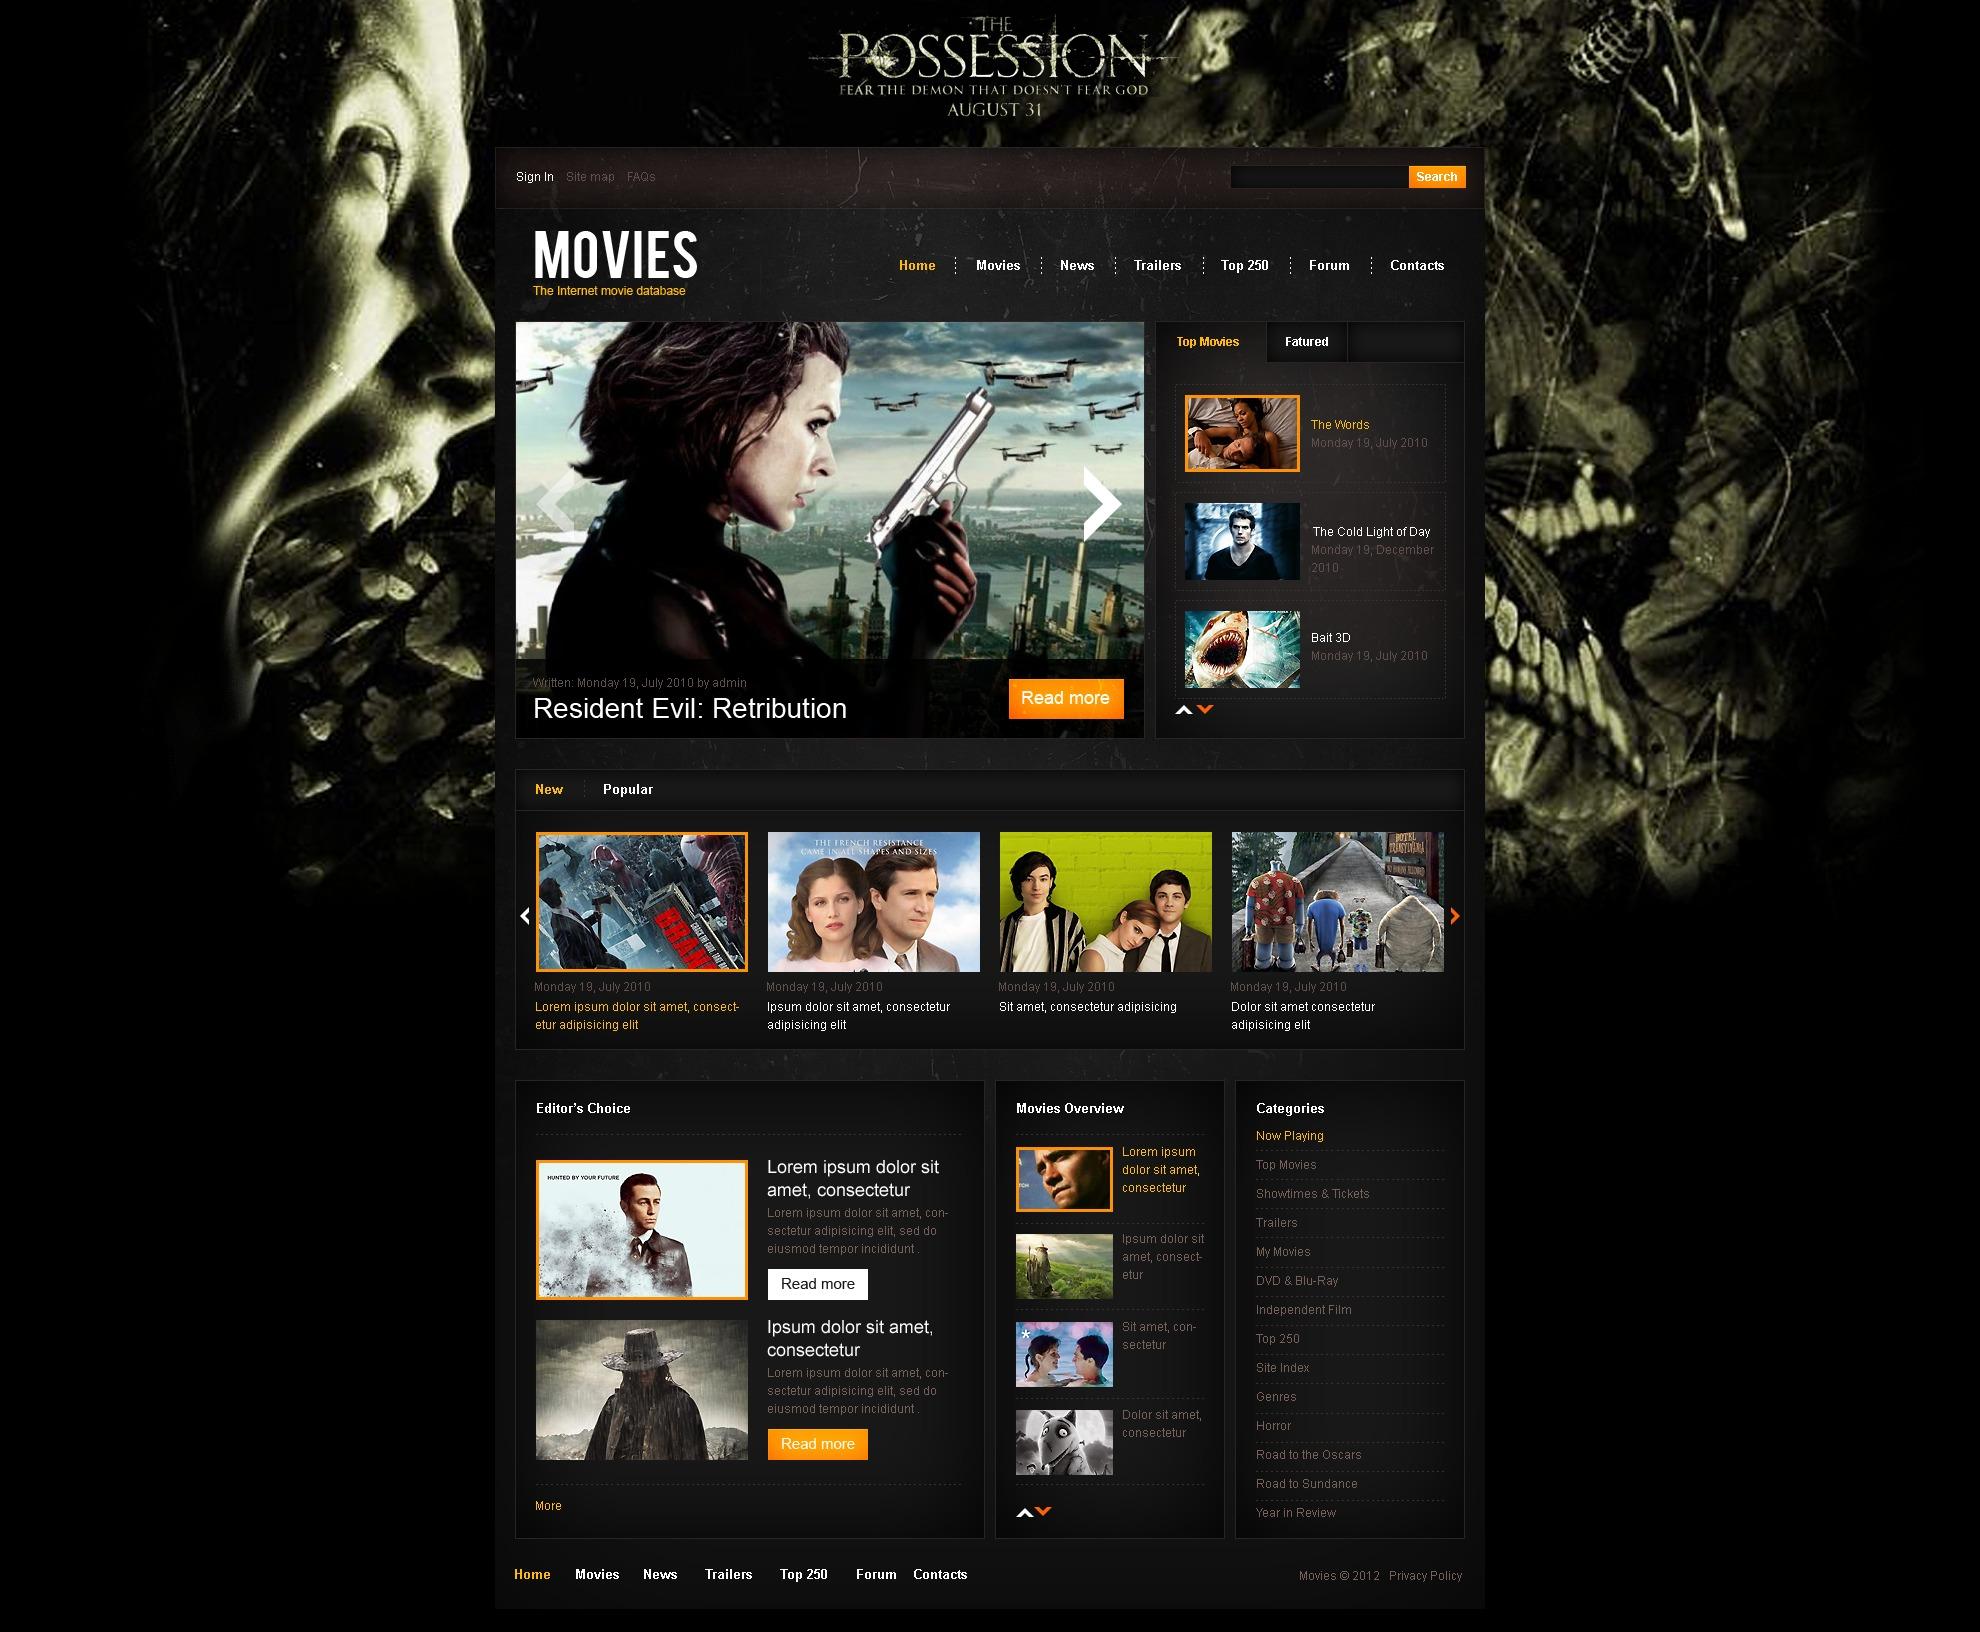 Internet Movie Database Drupal #44056 - Ekran resmi